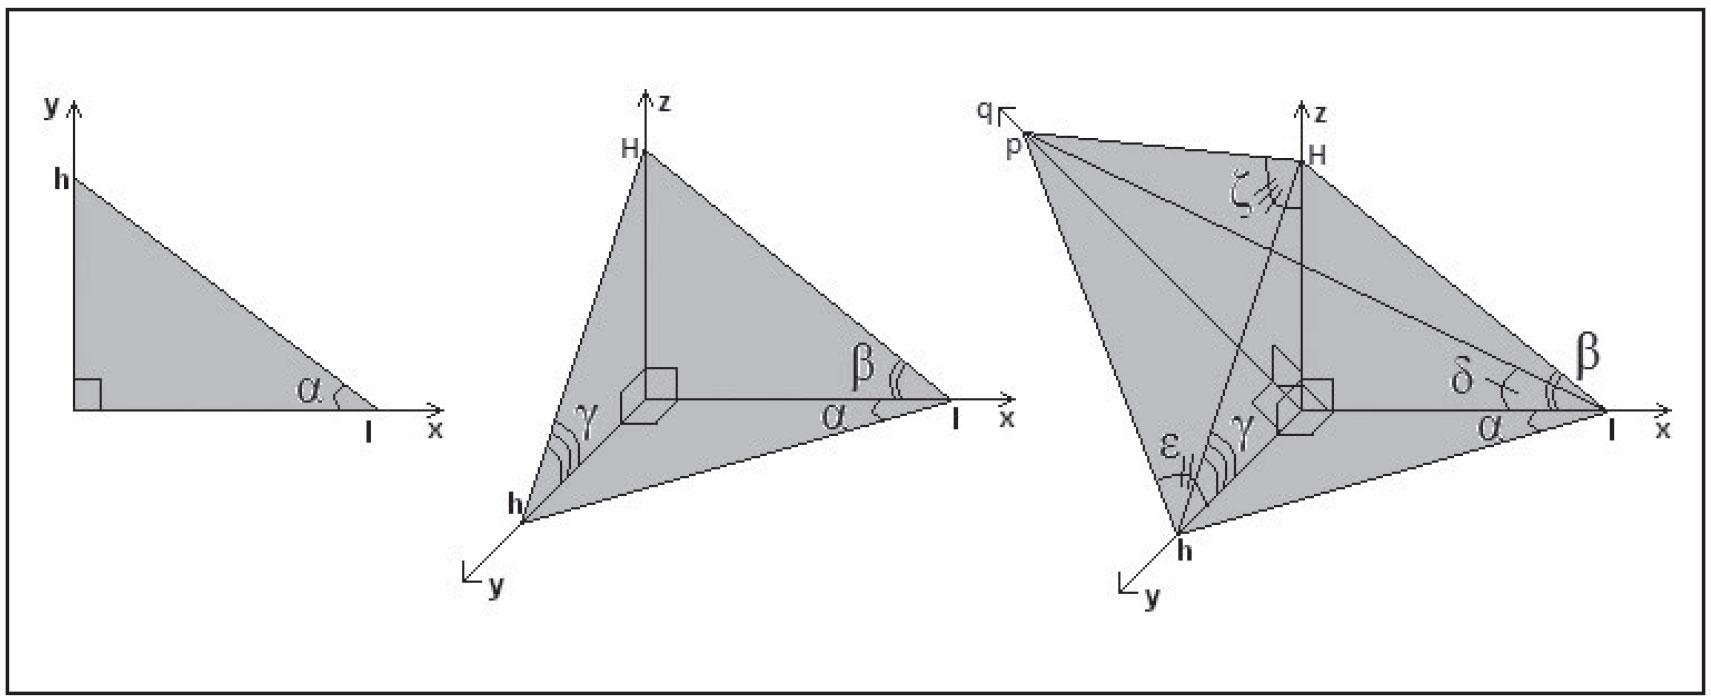 matematica-4-dimensiuni-stiinta-tehnica-11